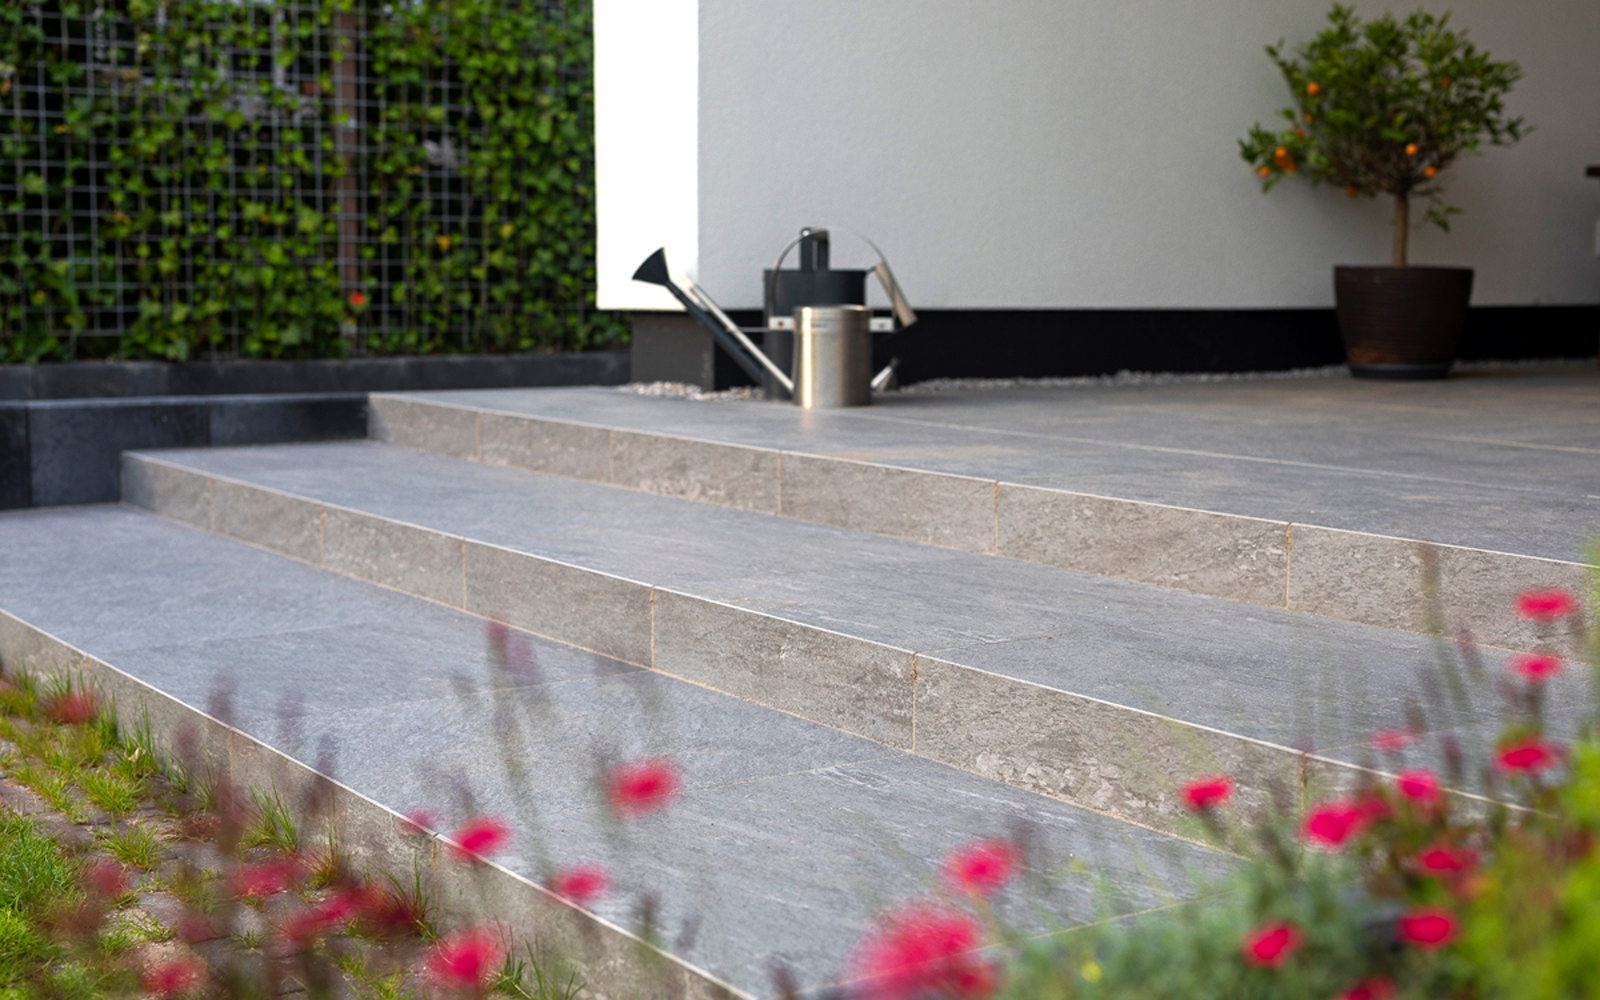 tuinbestrating, mbi de steenmeesters, the art of living